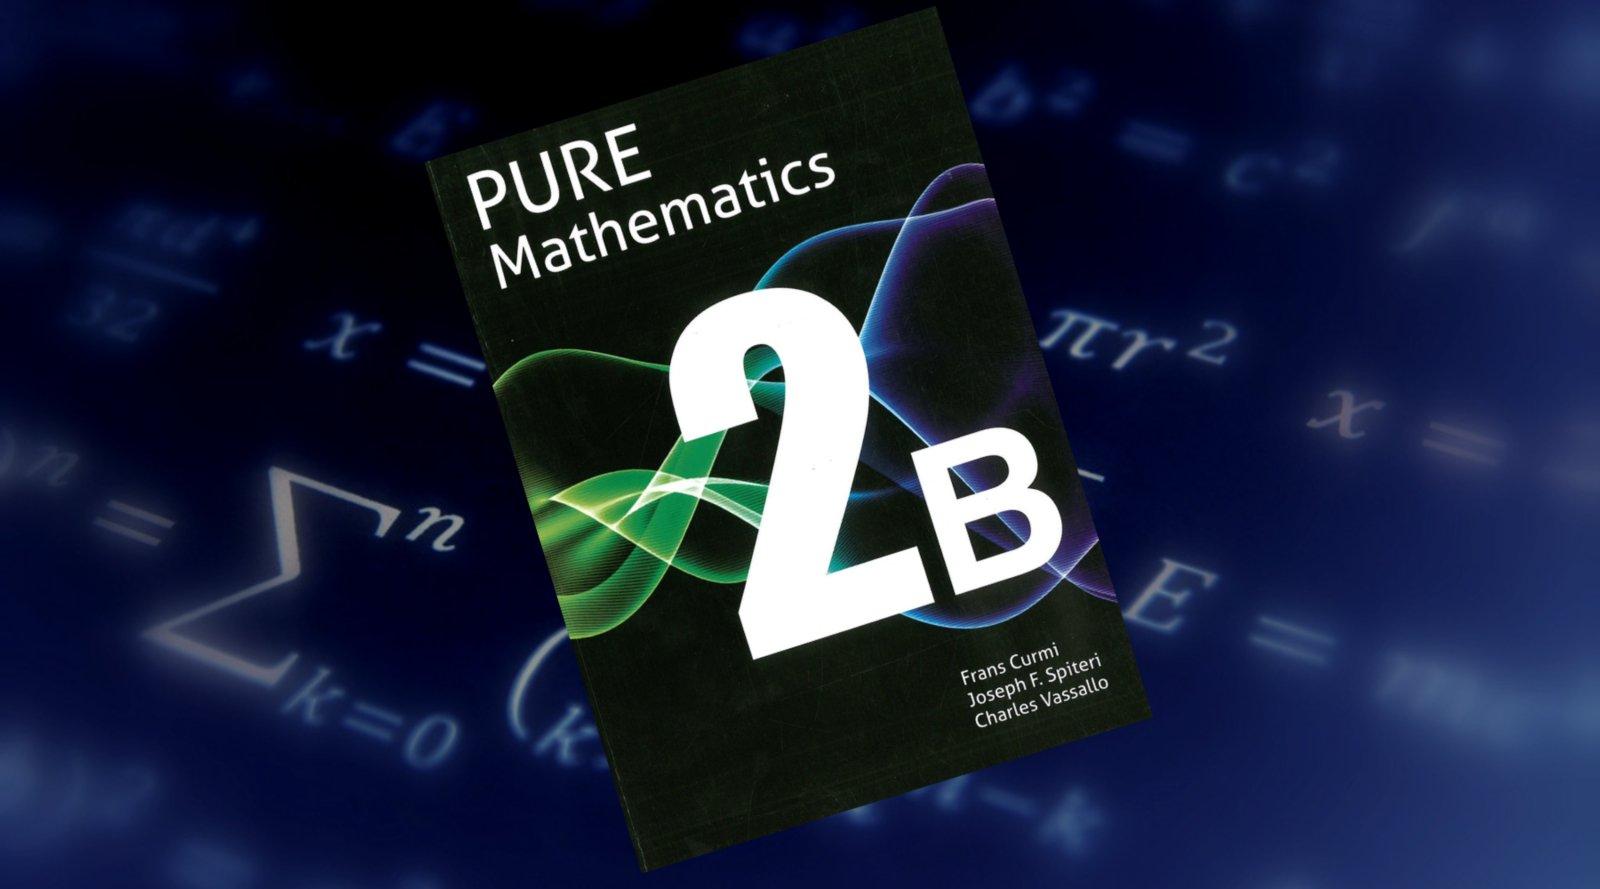 PURE Mathematics 2B